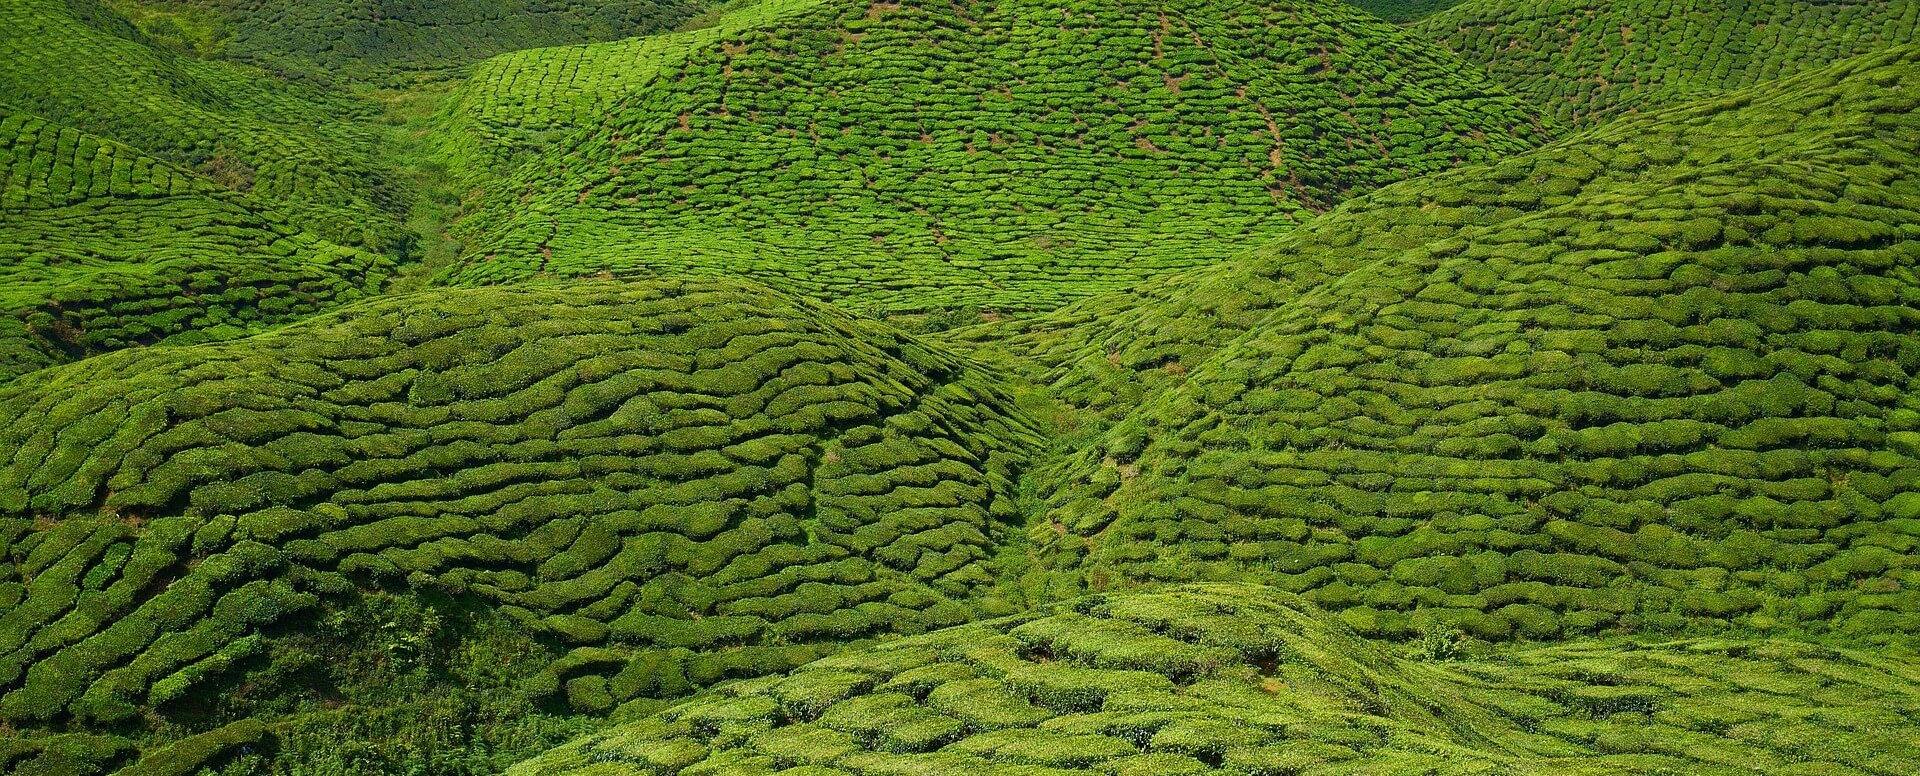 4. Tea lovers embark on a journey of tea - Mauritius